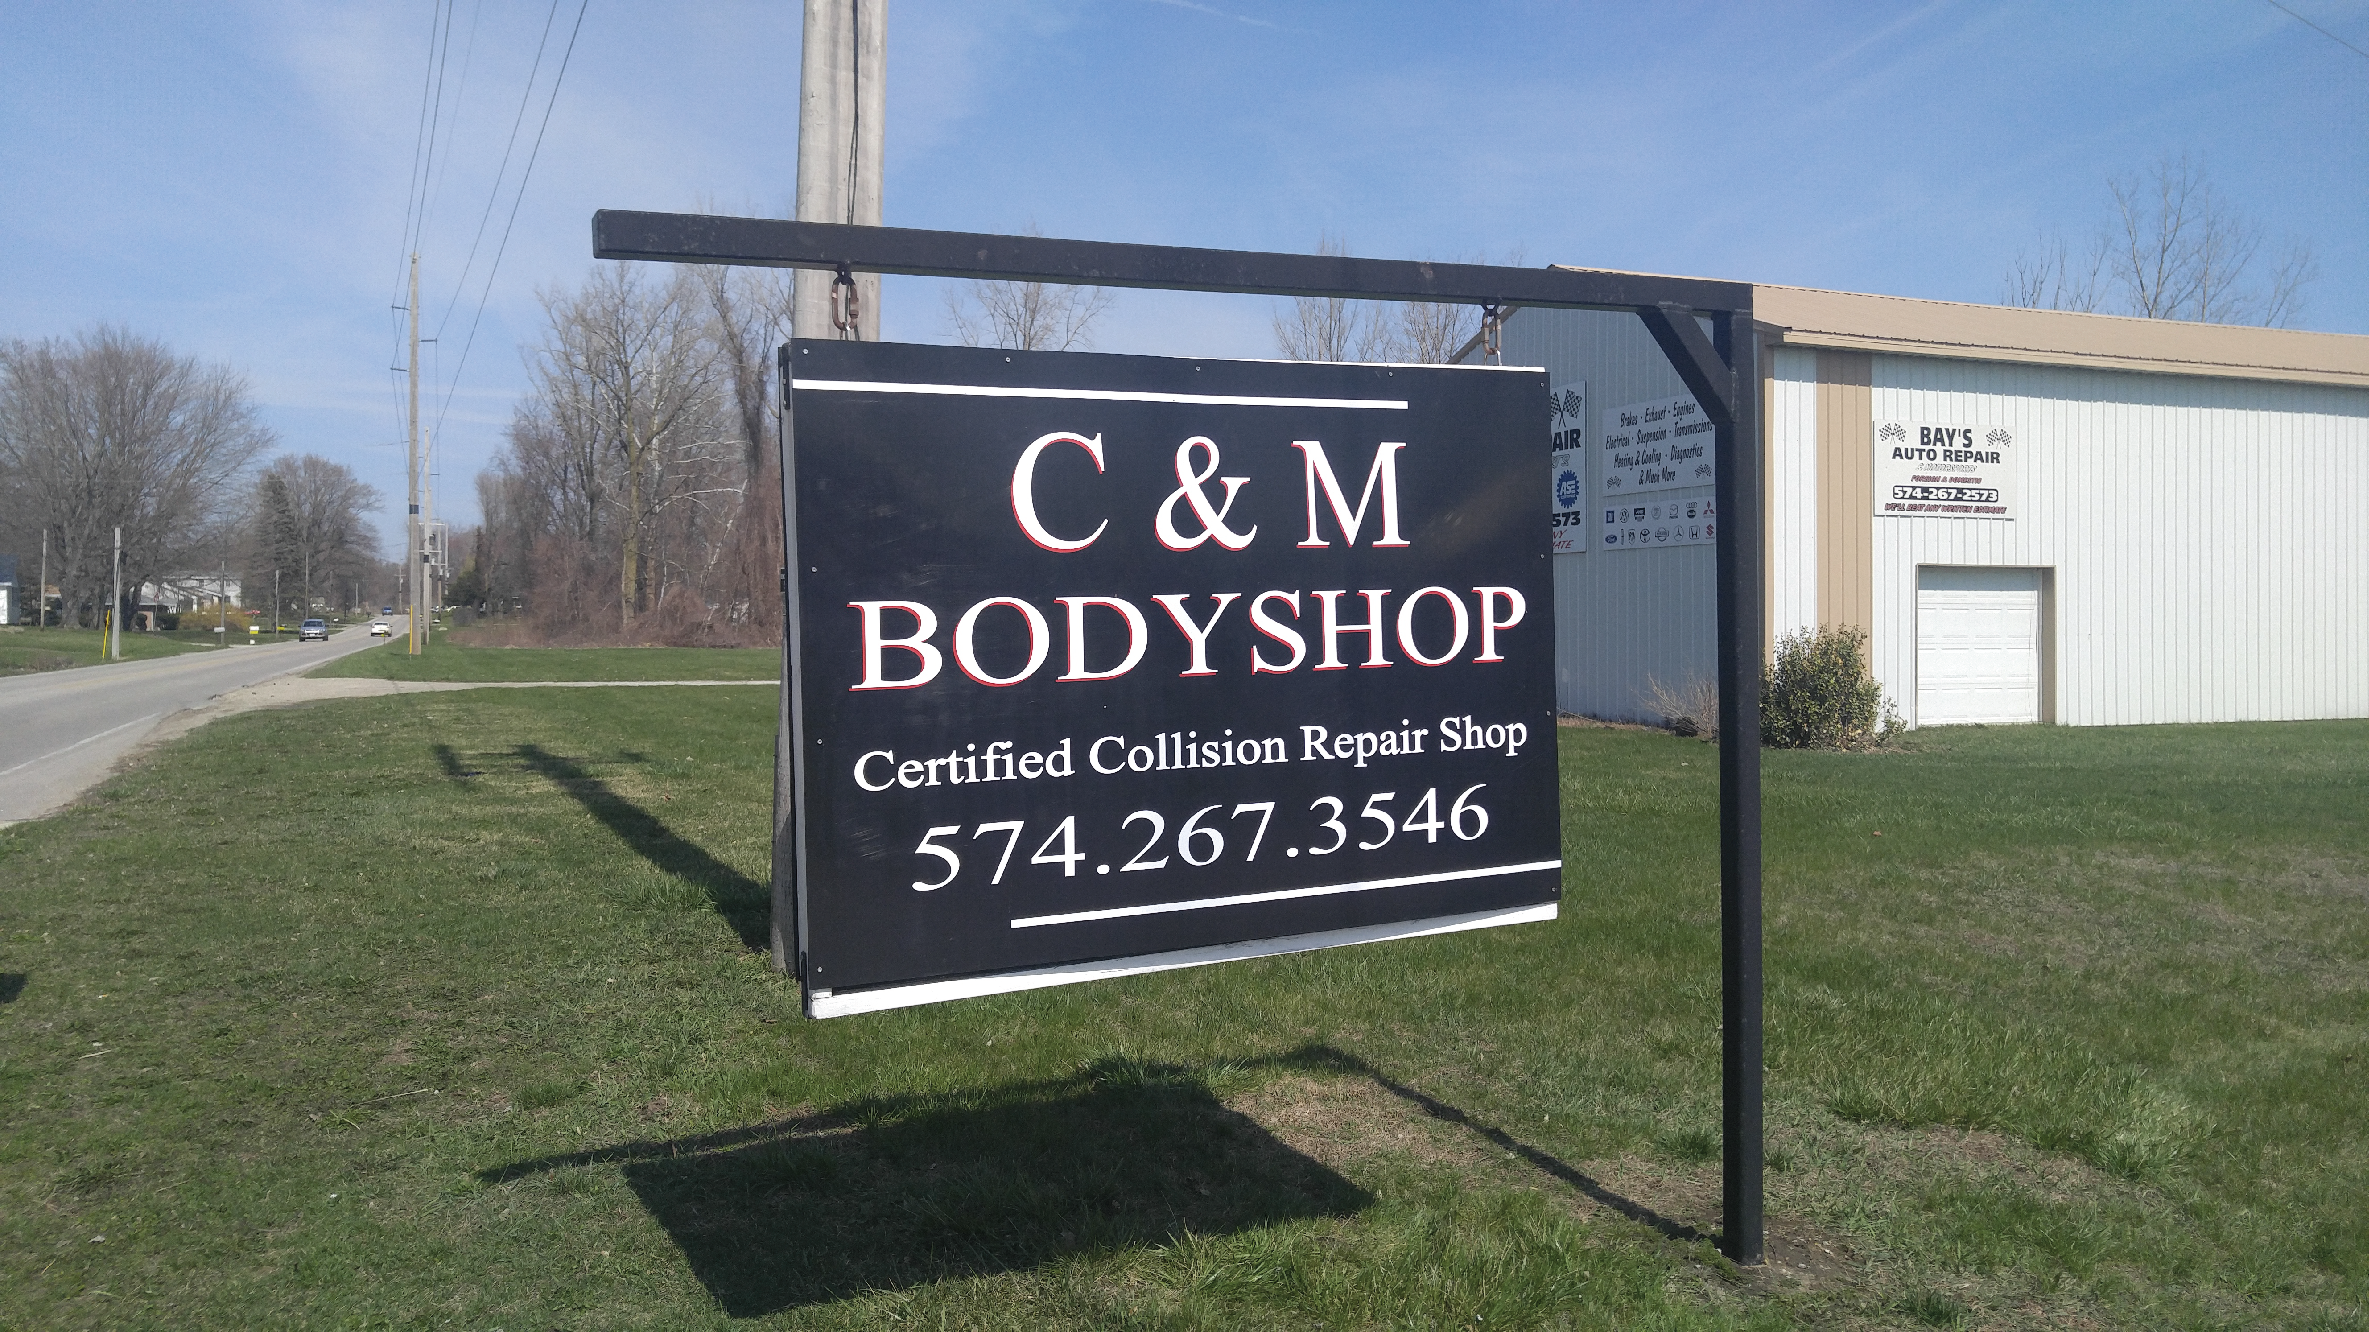 C&M Bodyshop - Warsaw, IN